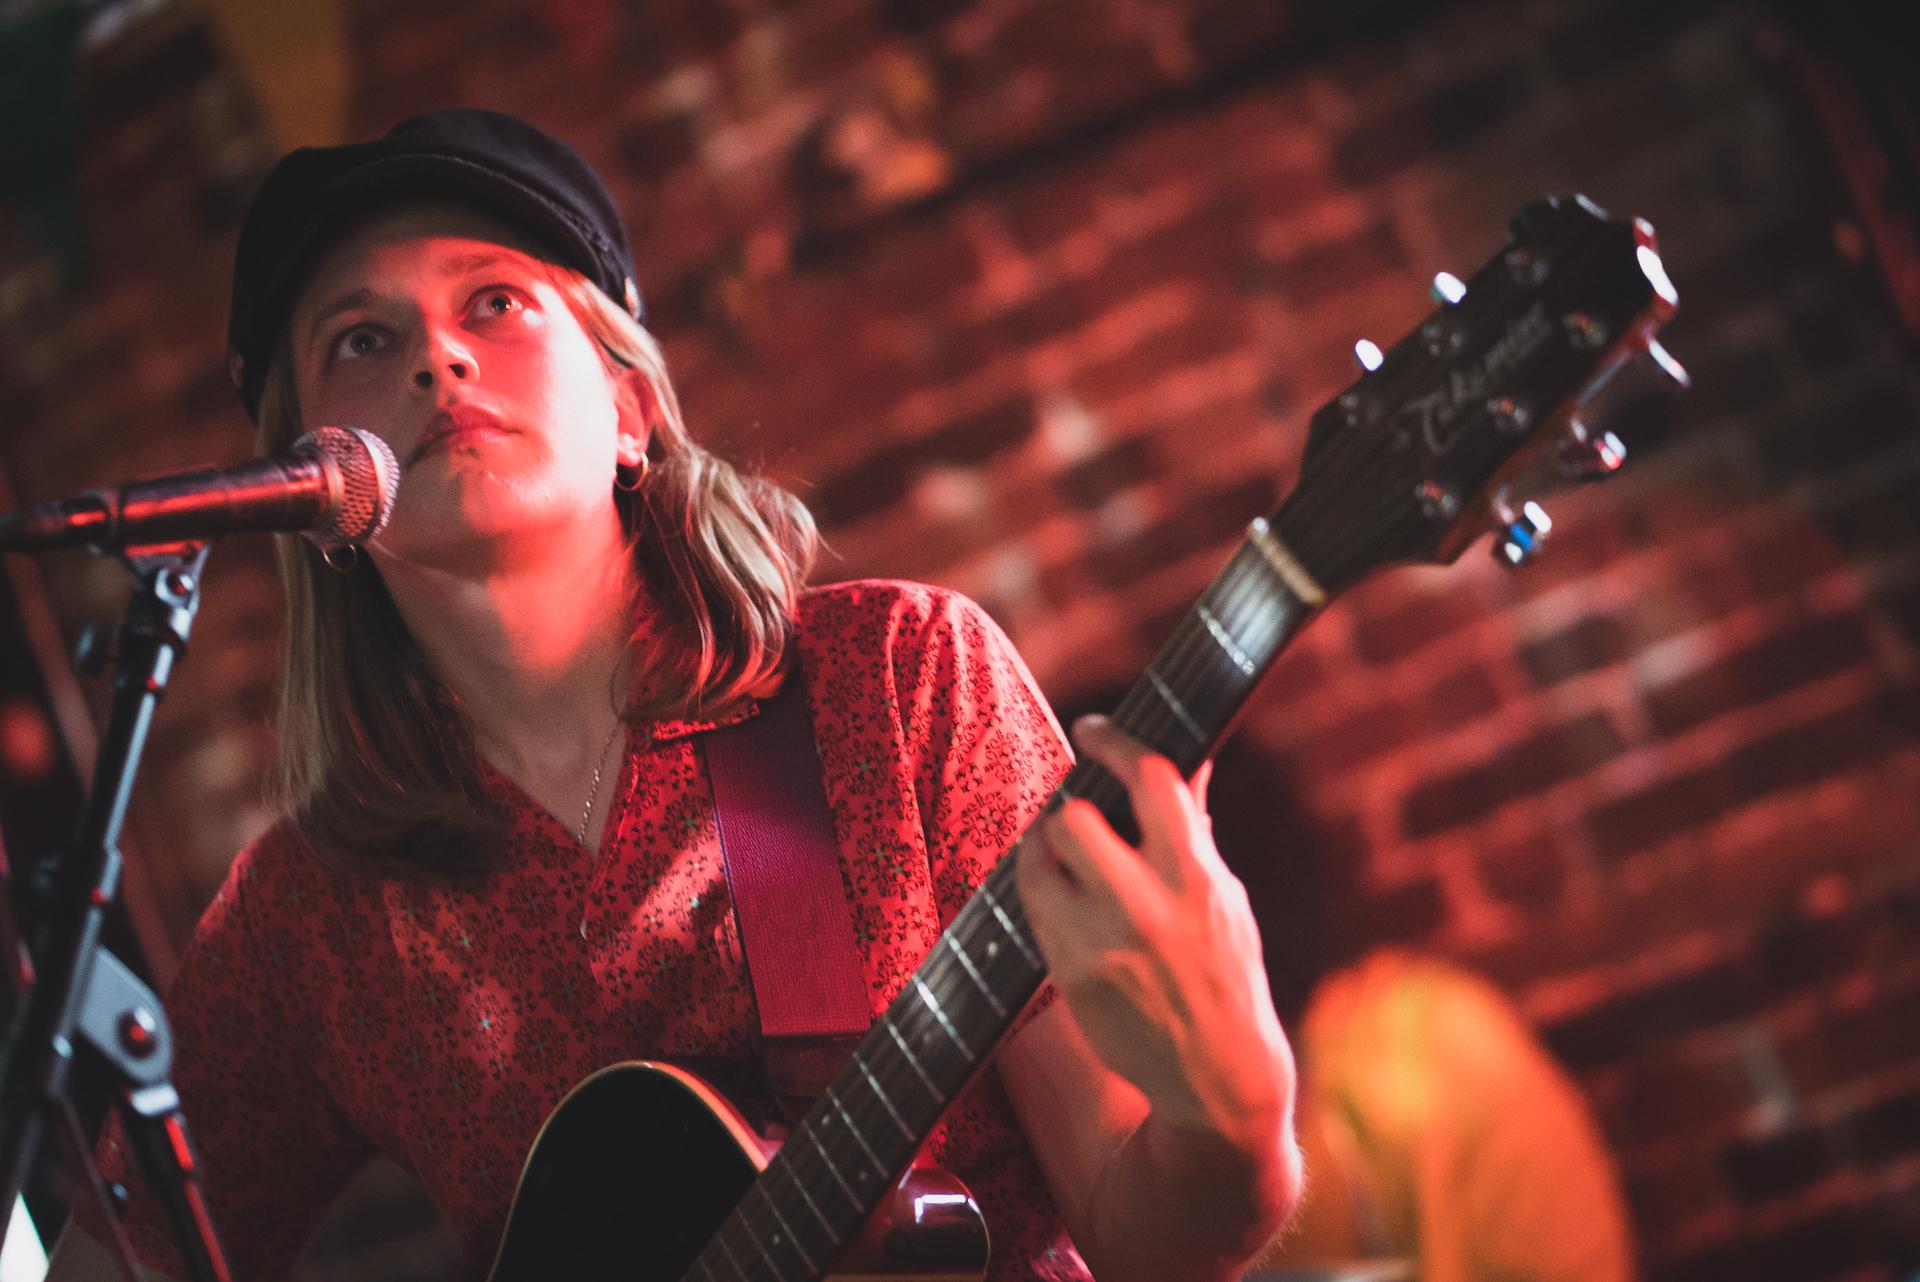 Random bands at Lock Tavern: When Young